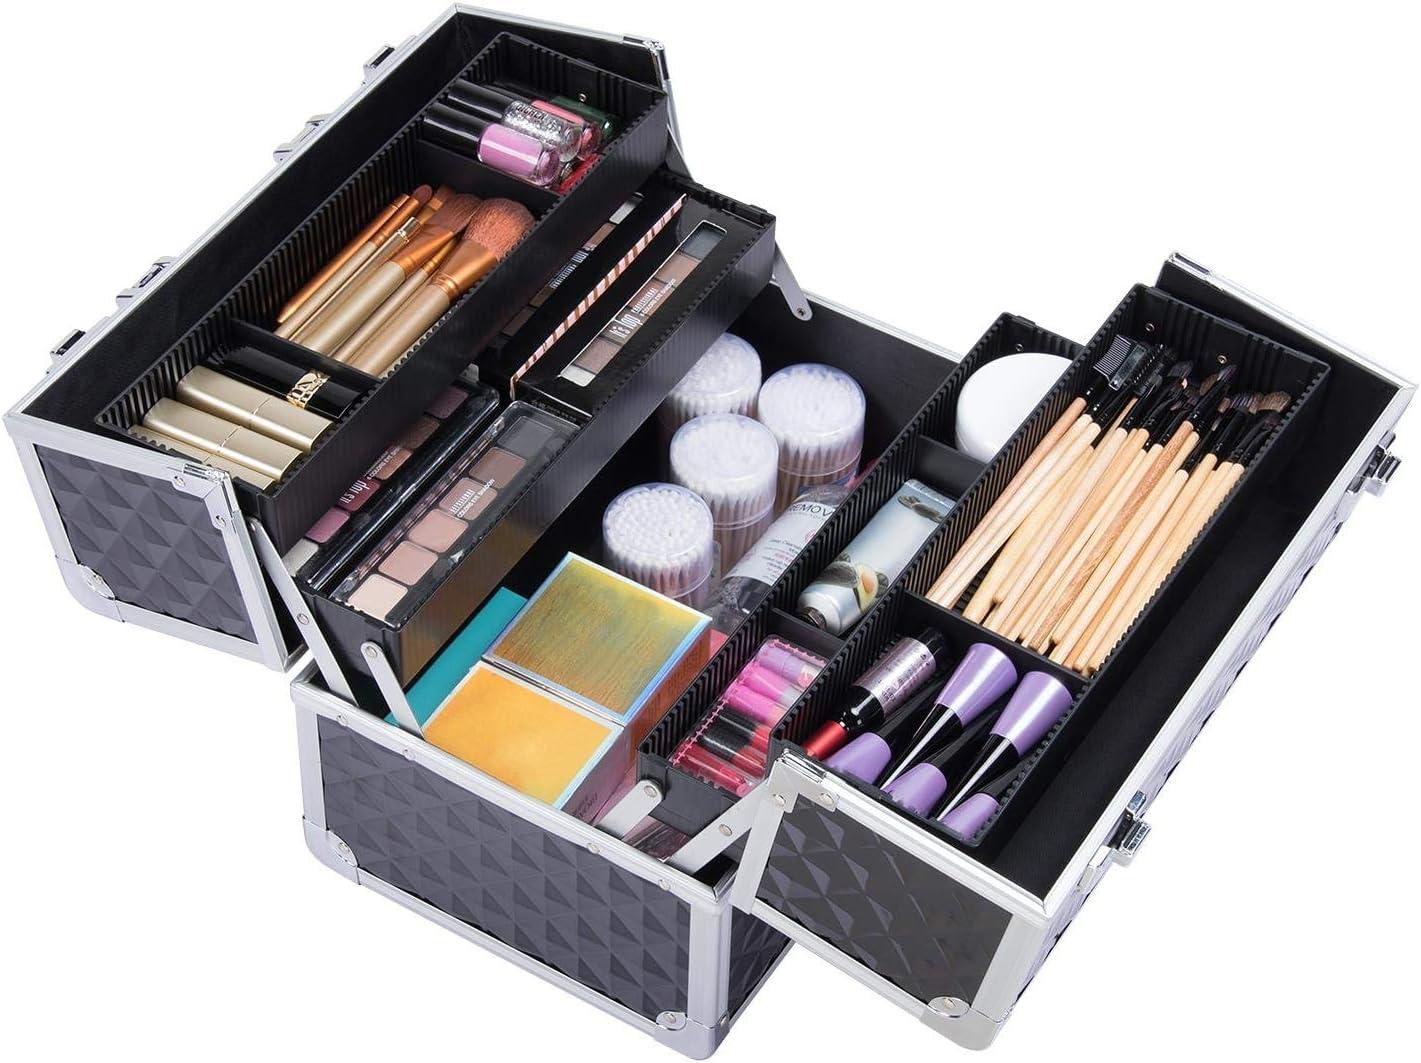 Yaheetech Kosmetikkoffer Friseur Koffer Trolly Alu Beauty Make-up Case Multikoffer Werkzeugkoffer abschlie/ßbar